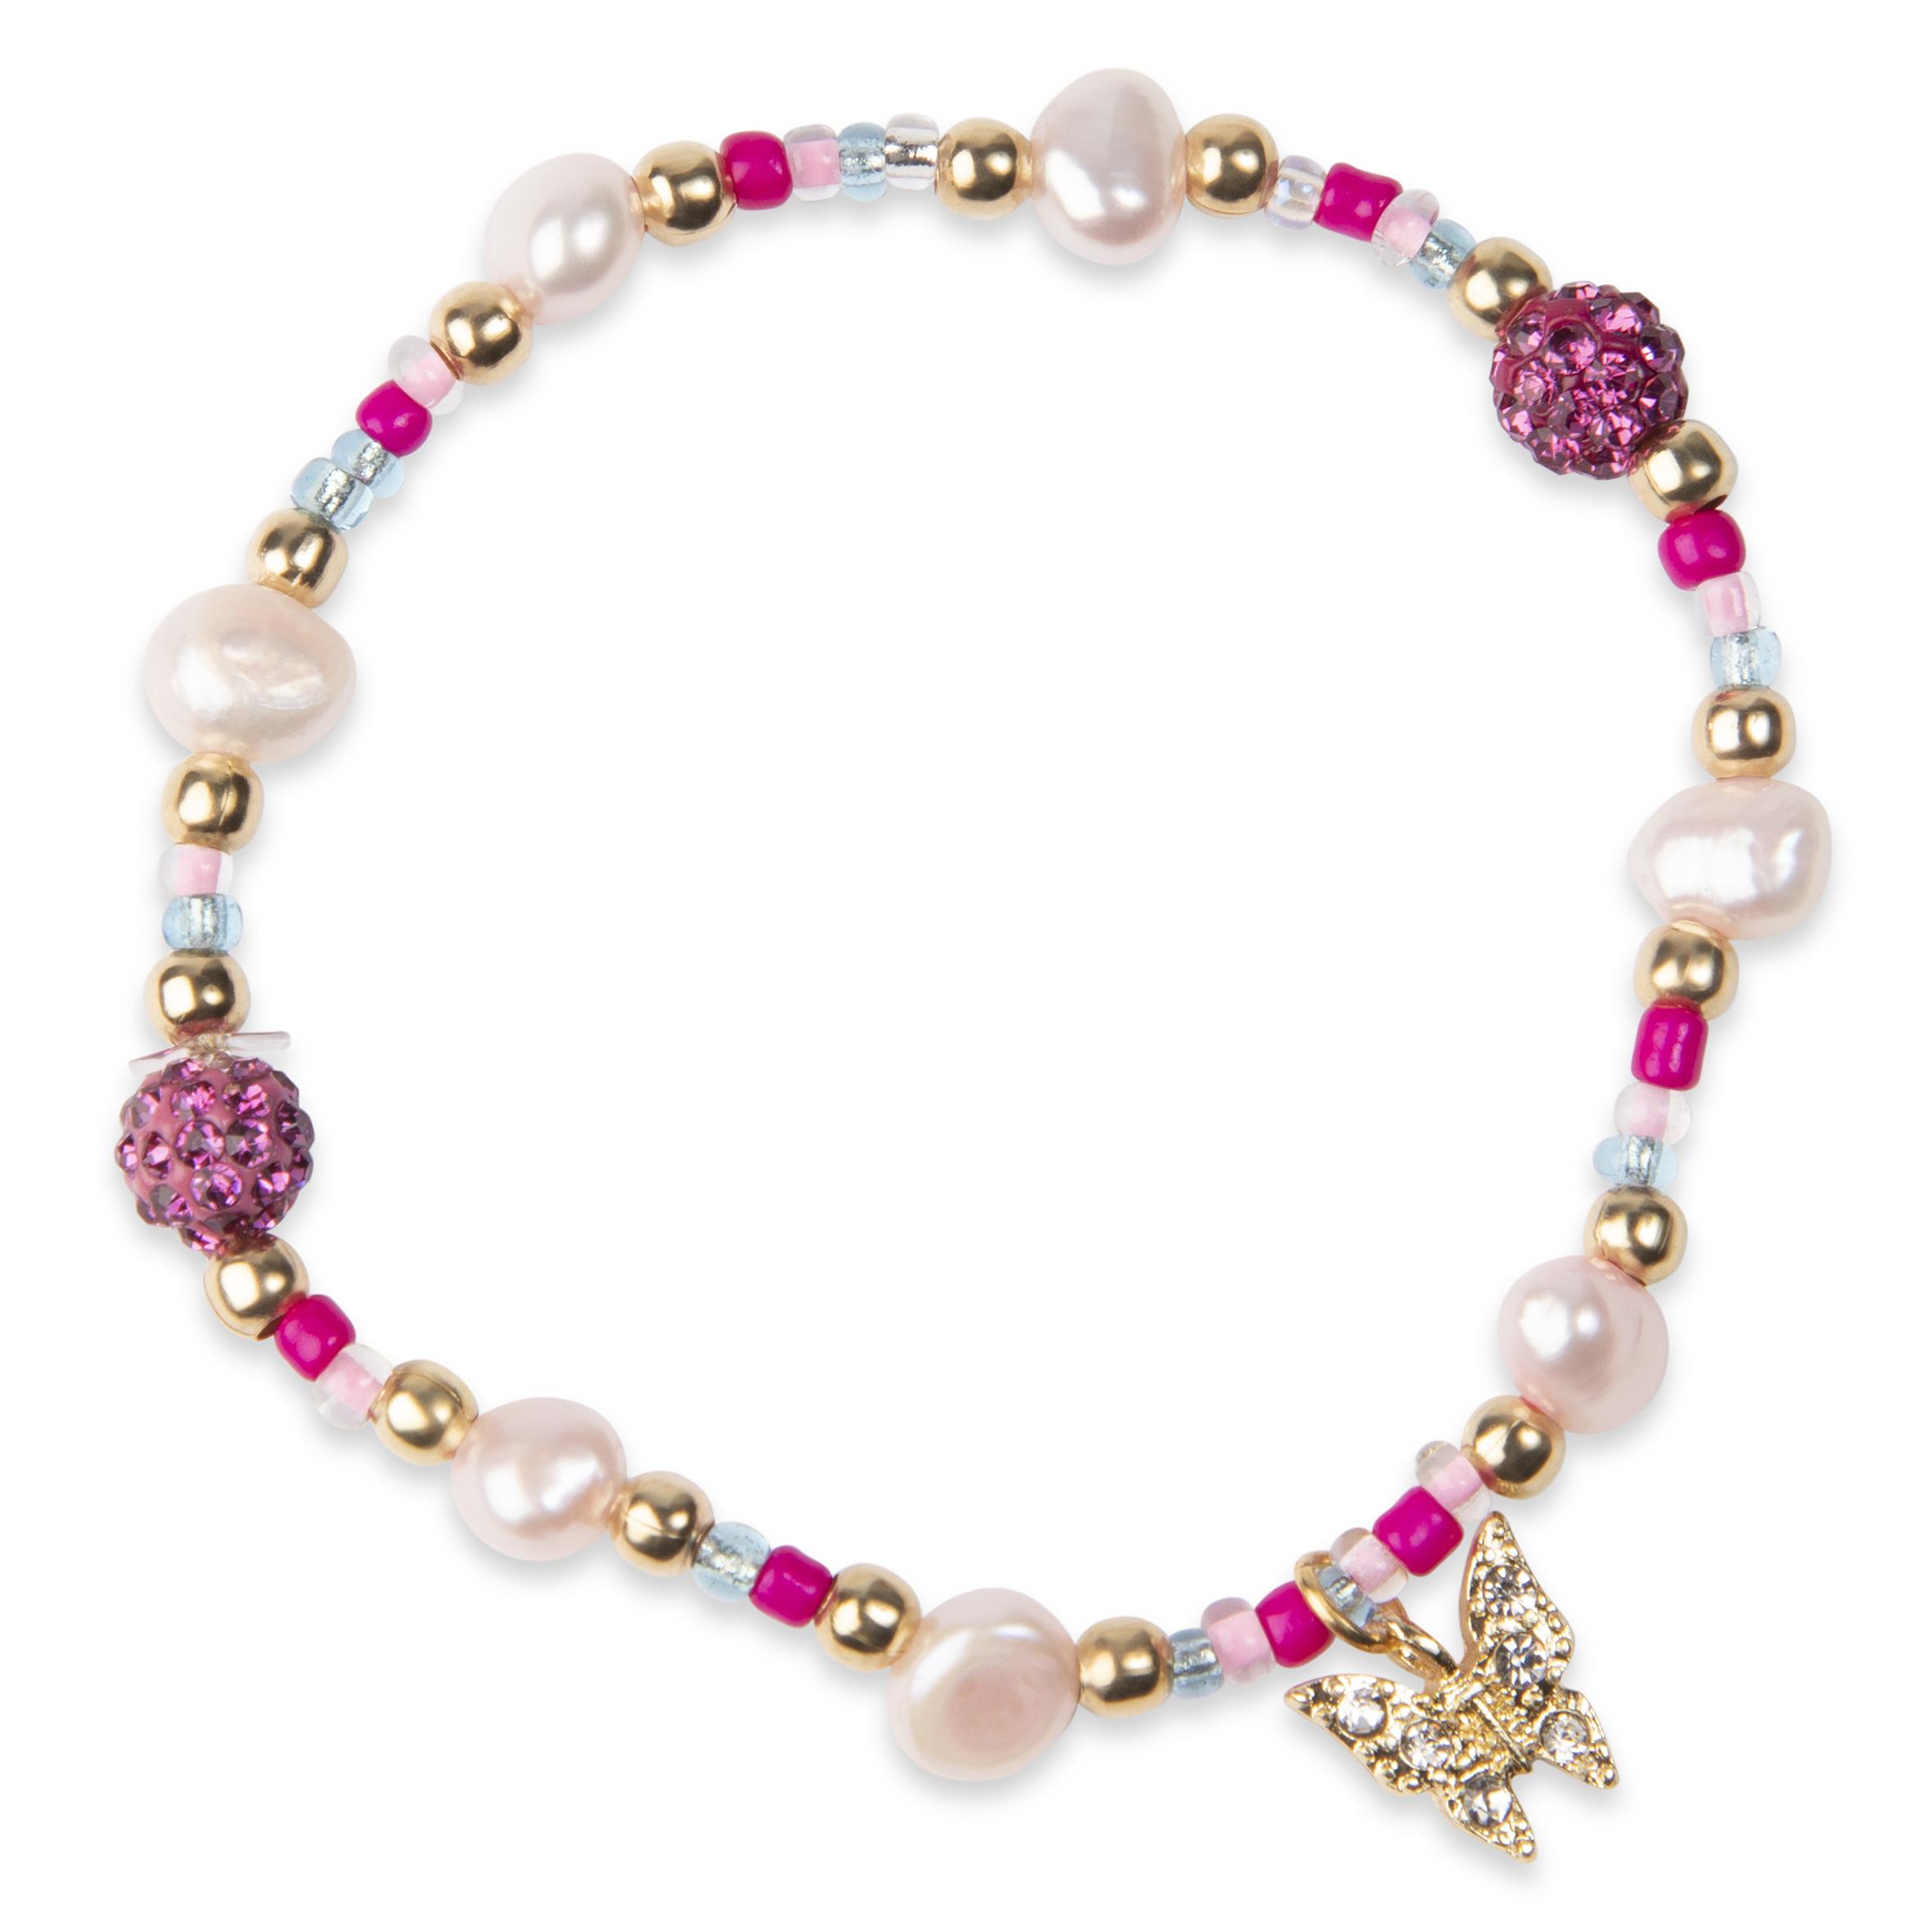 Barnsmycke pfg Stockholm Pearls Kids-Angie Bracelet 11003-01